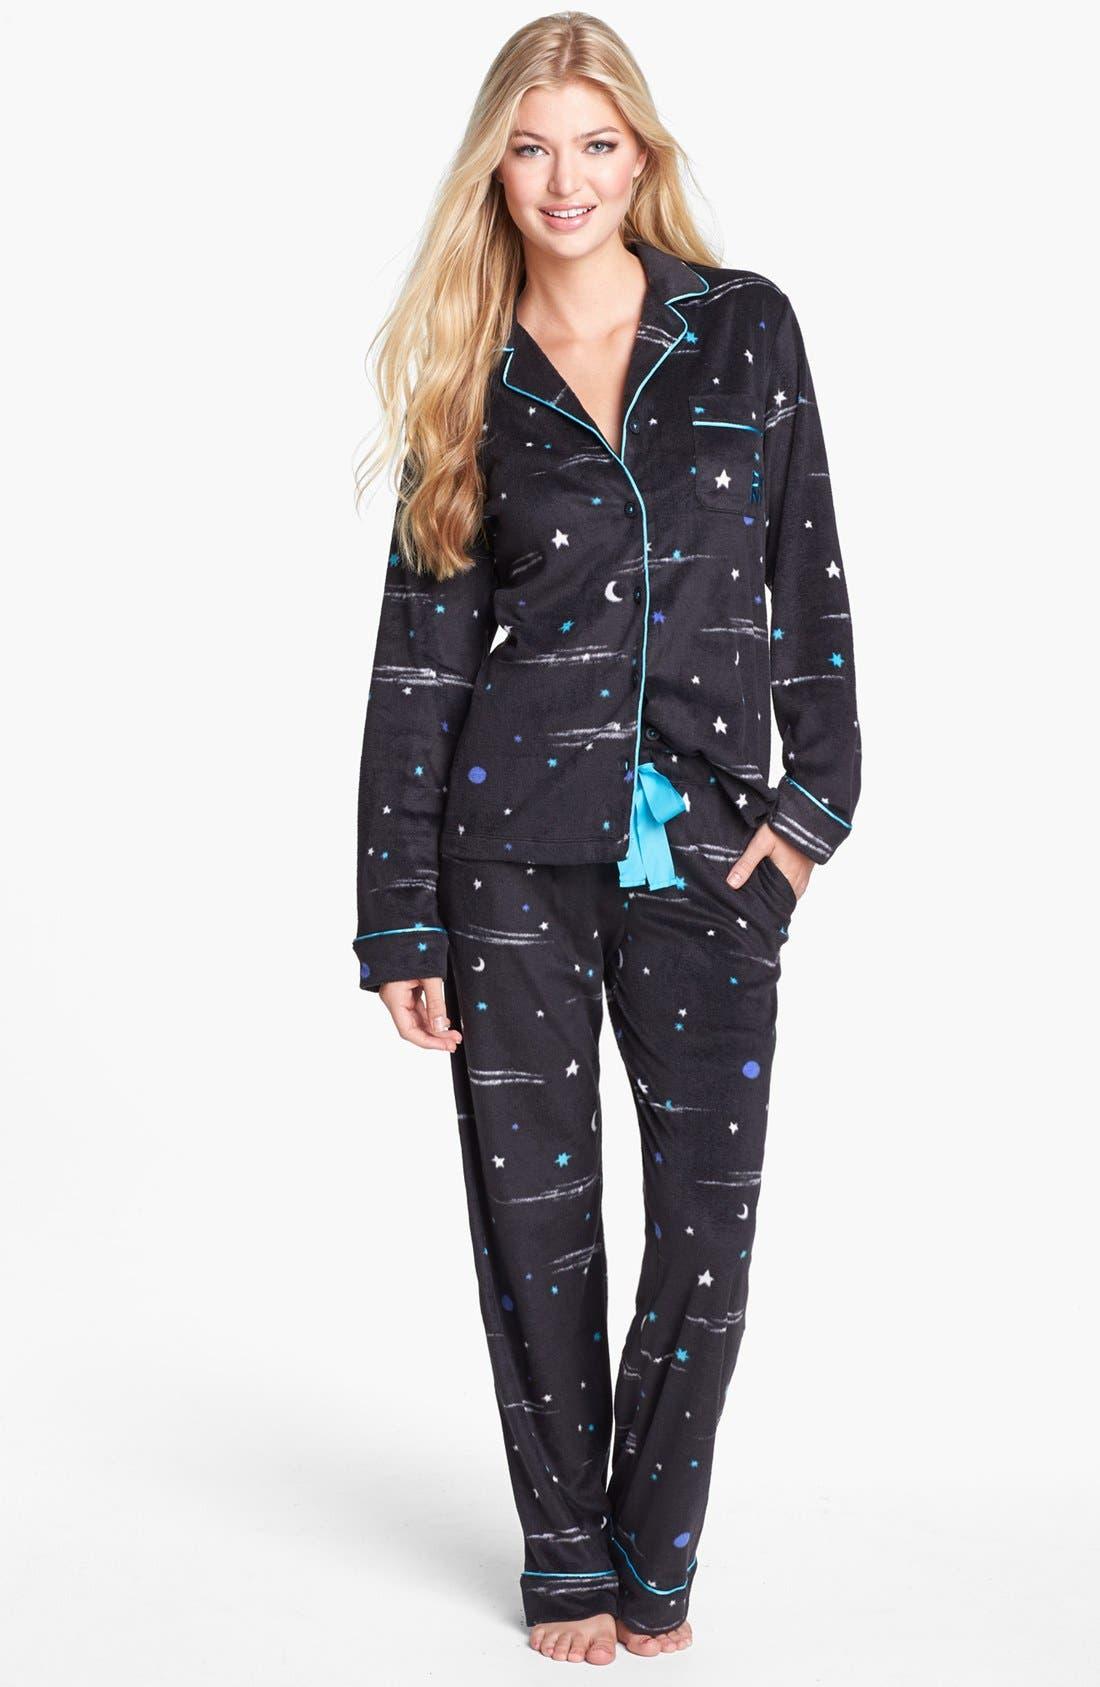 Main Image - DKNY 'Wish List' Fleece Pajamas